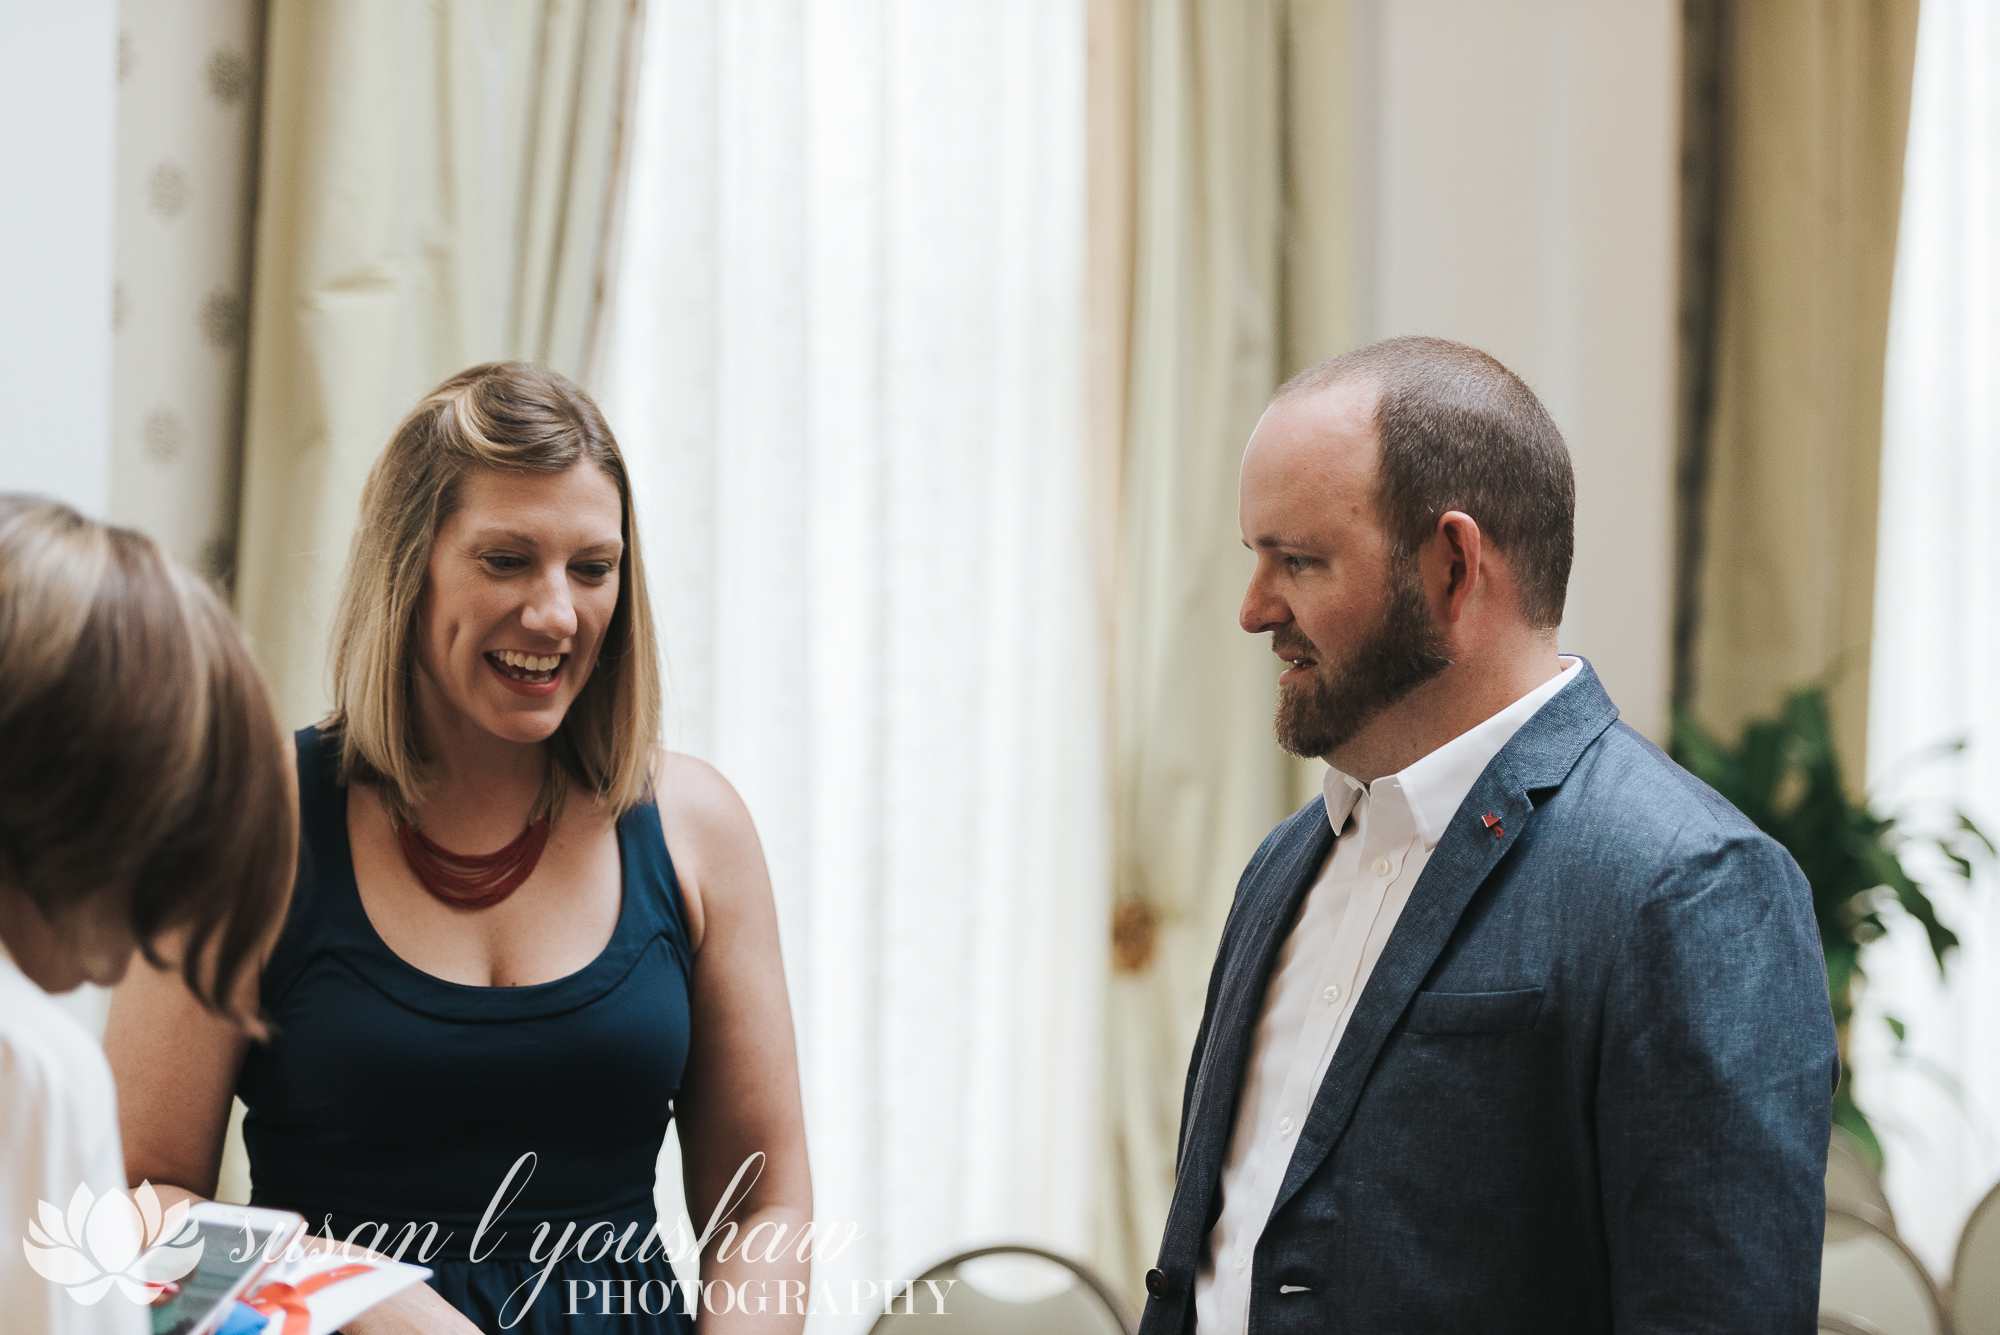 BLOG Carolyn Adams and Jim McCune 07-04-2018 SLY Photography-58.jpg